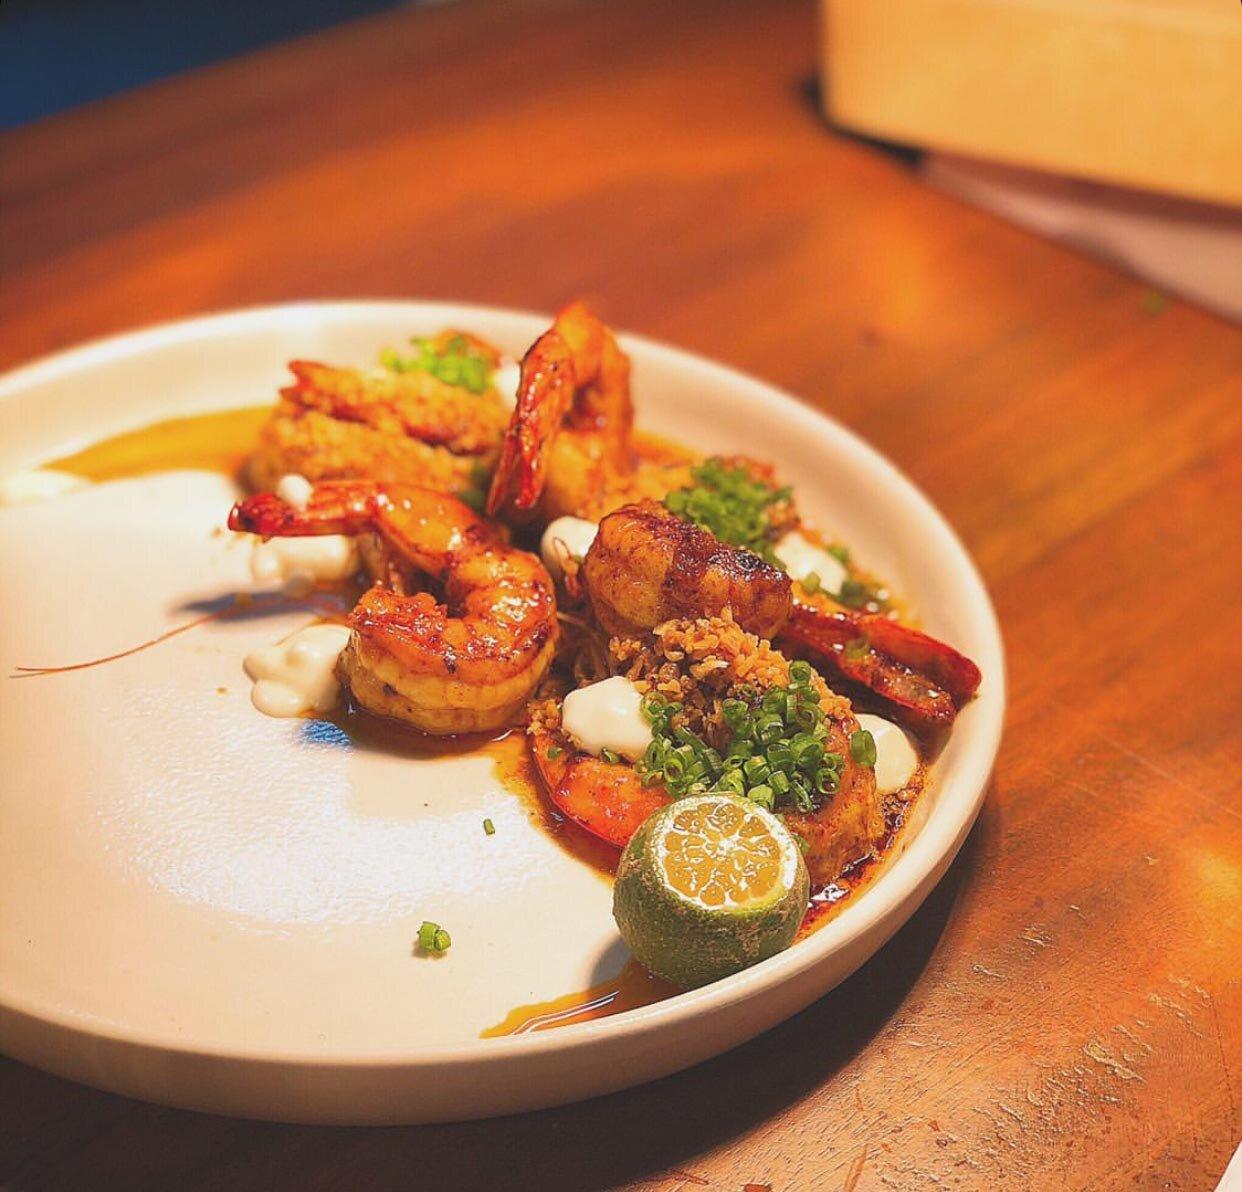 Mijo's Aligue Gambas (prawns, crab fat, crispy garlic, aioli, and calamansi)